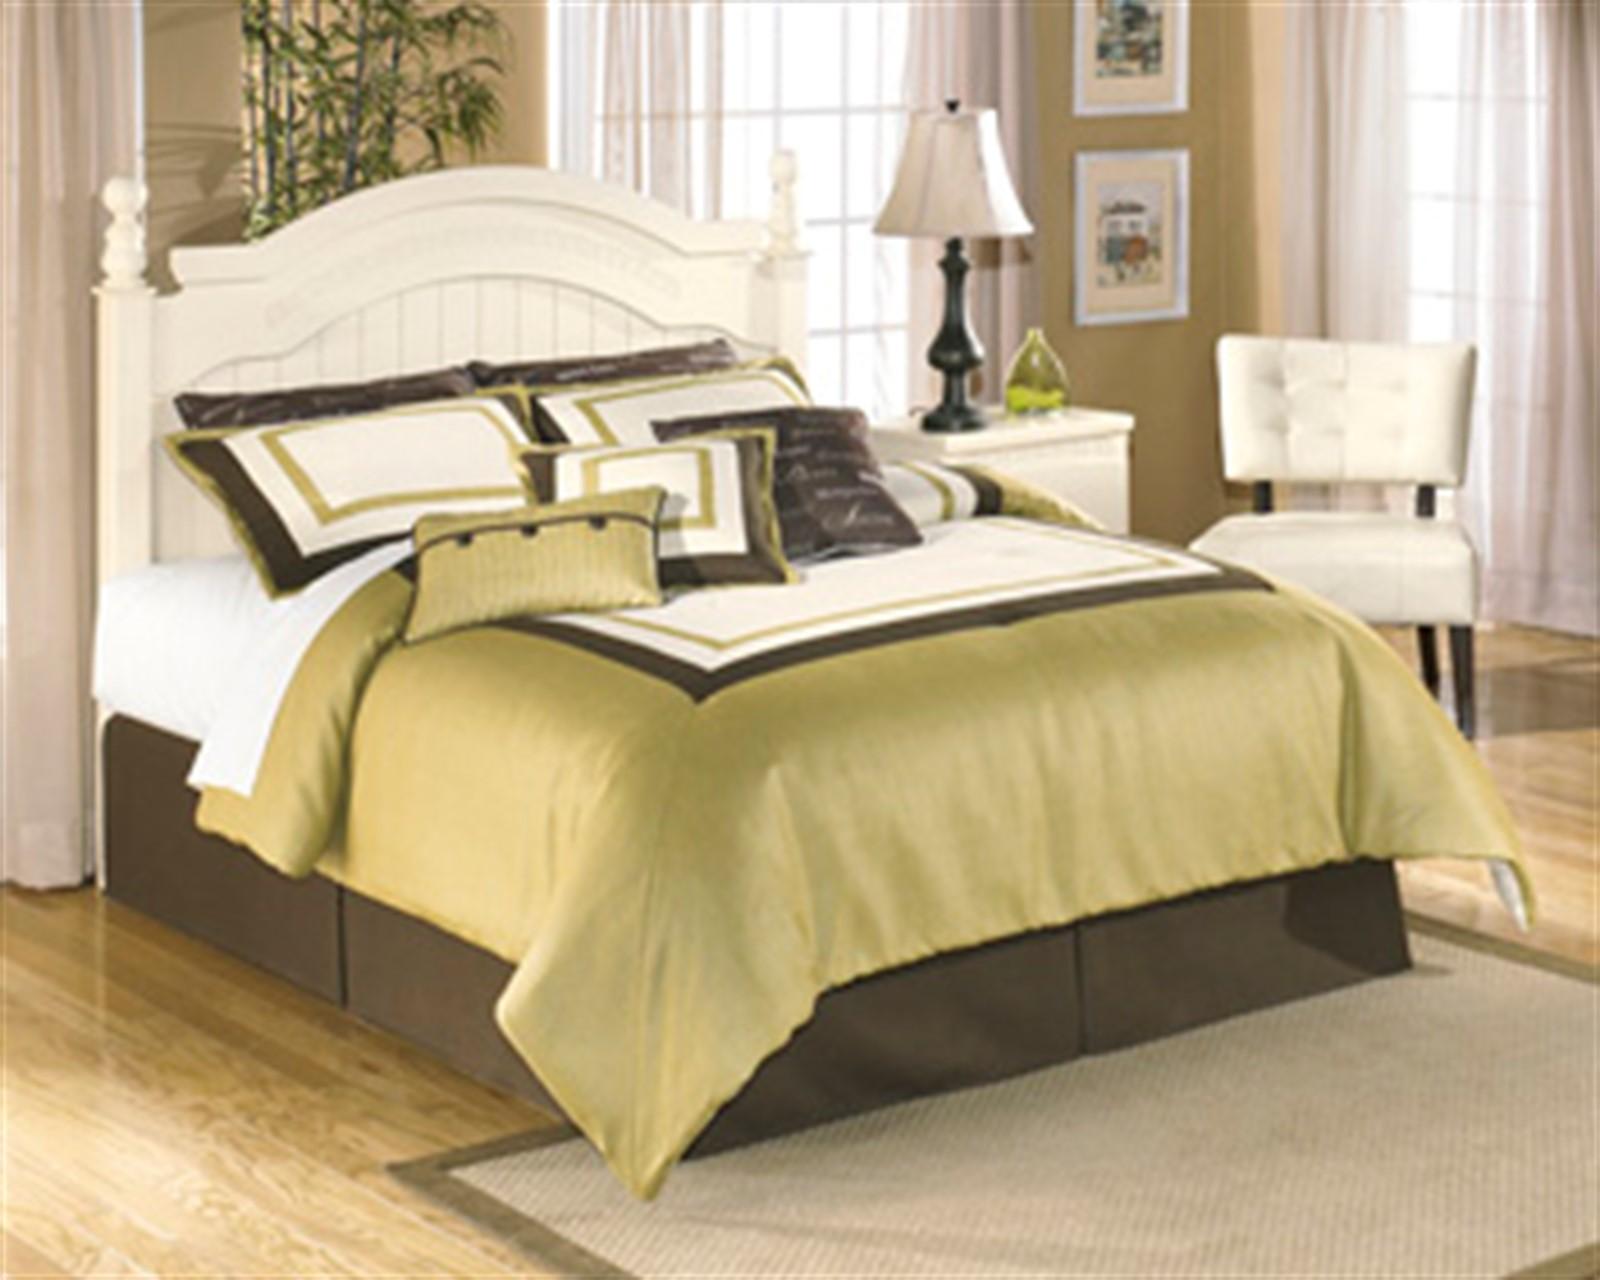 Cottage Retreat Cream Queen Poster Bed